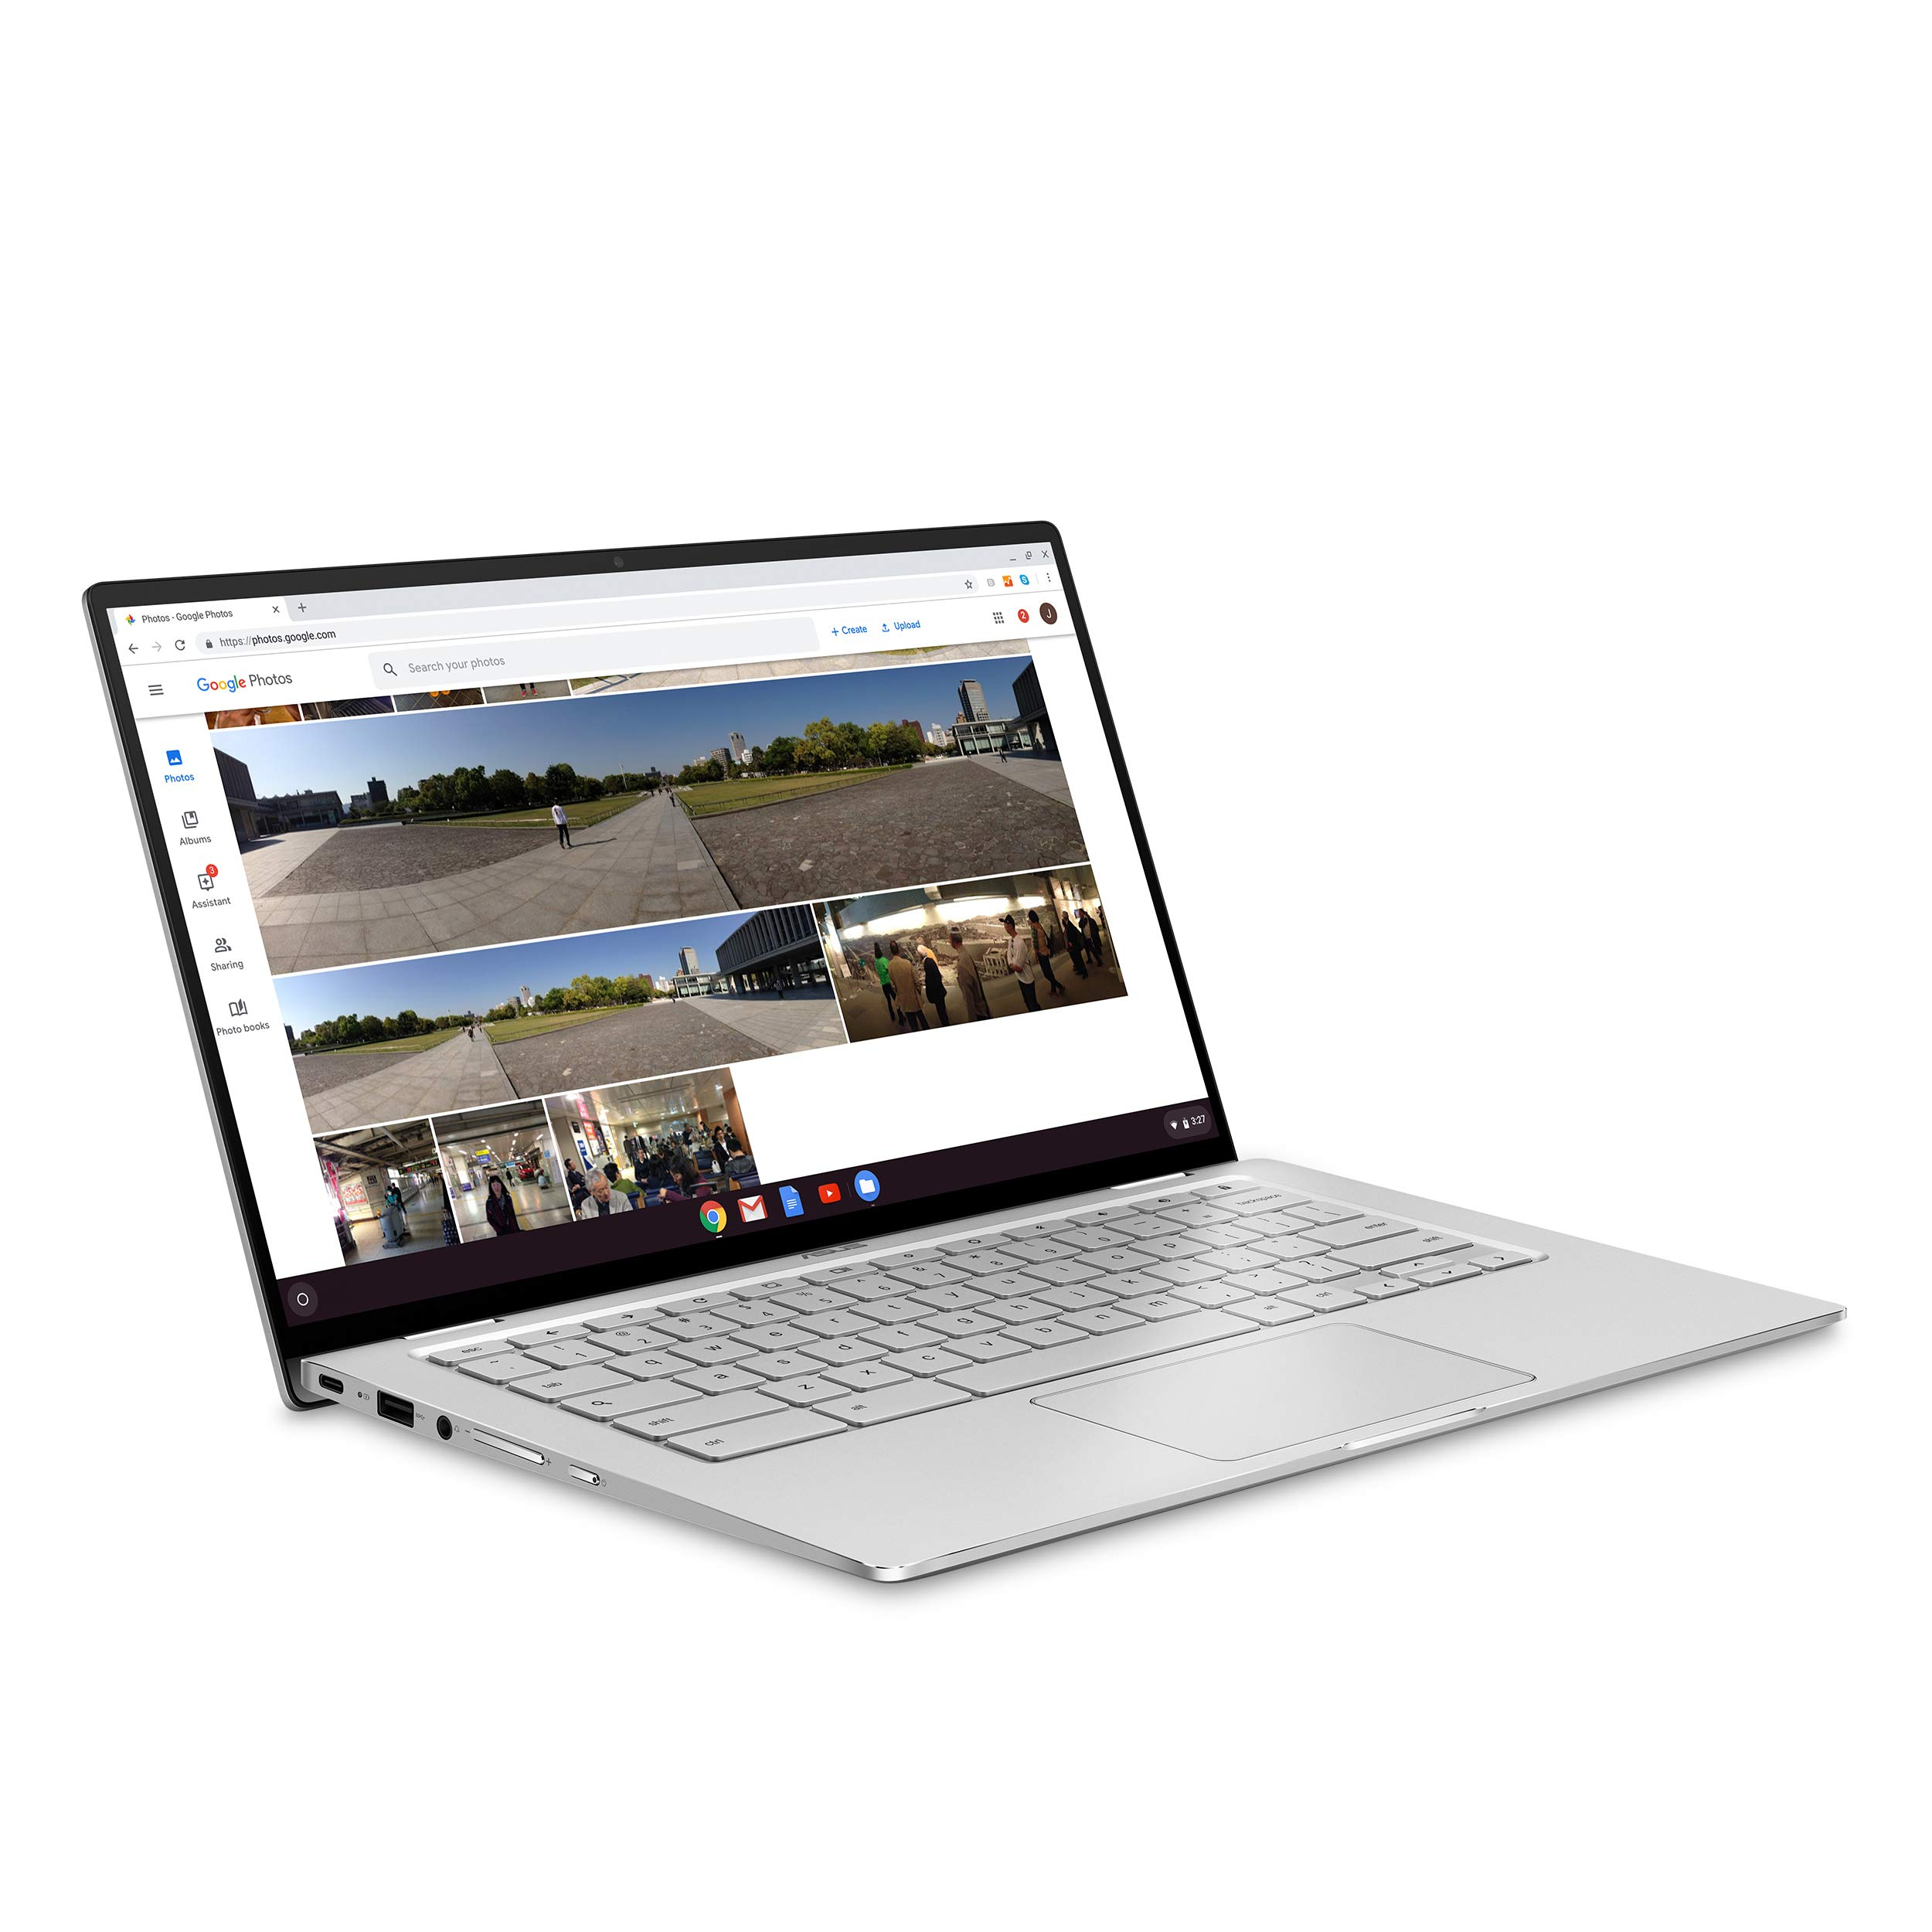 ASUS Chromebook Flip C434TA-DSM4T 2-in-1 Laptop 14'' Touchscreen Full HD 4-Way NanoEdge, Intel Core M3-8100Y Processor, 4GB RAM, 64GB eMMC Storage, Chrome OS by ASUS (Image #4)